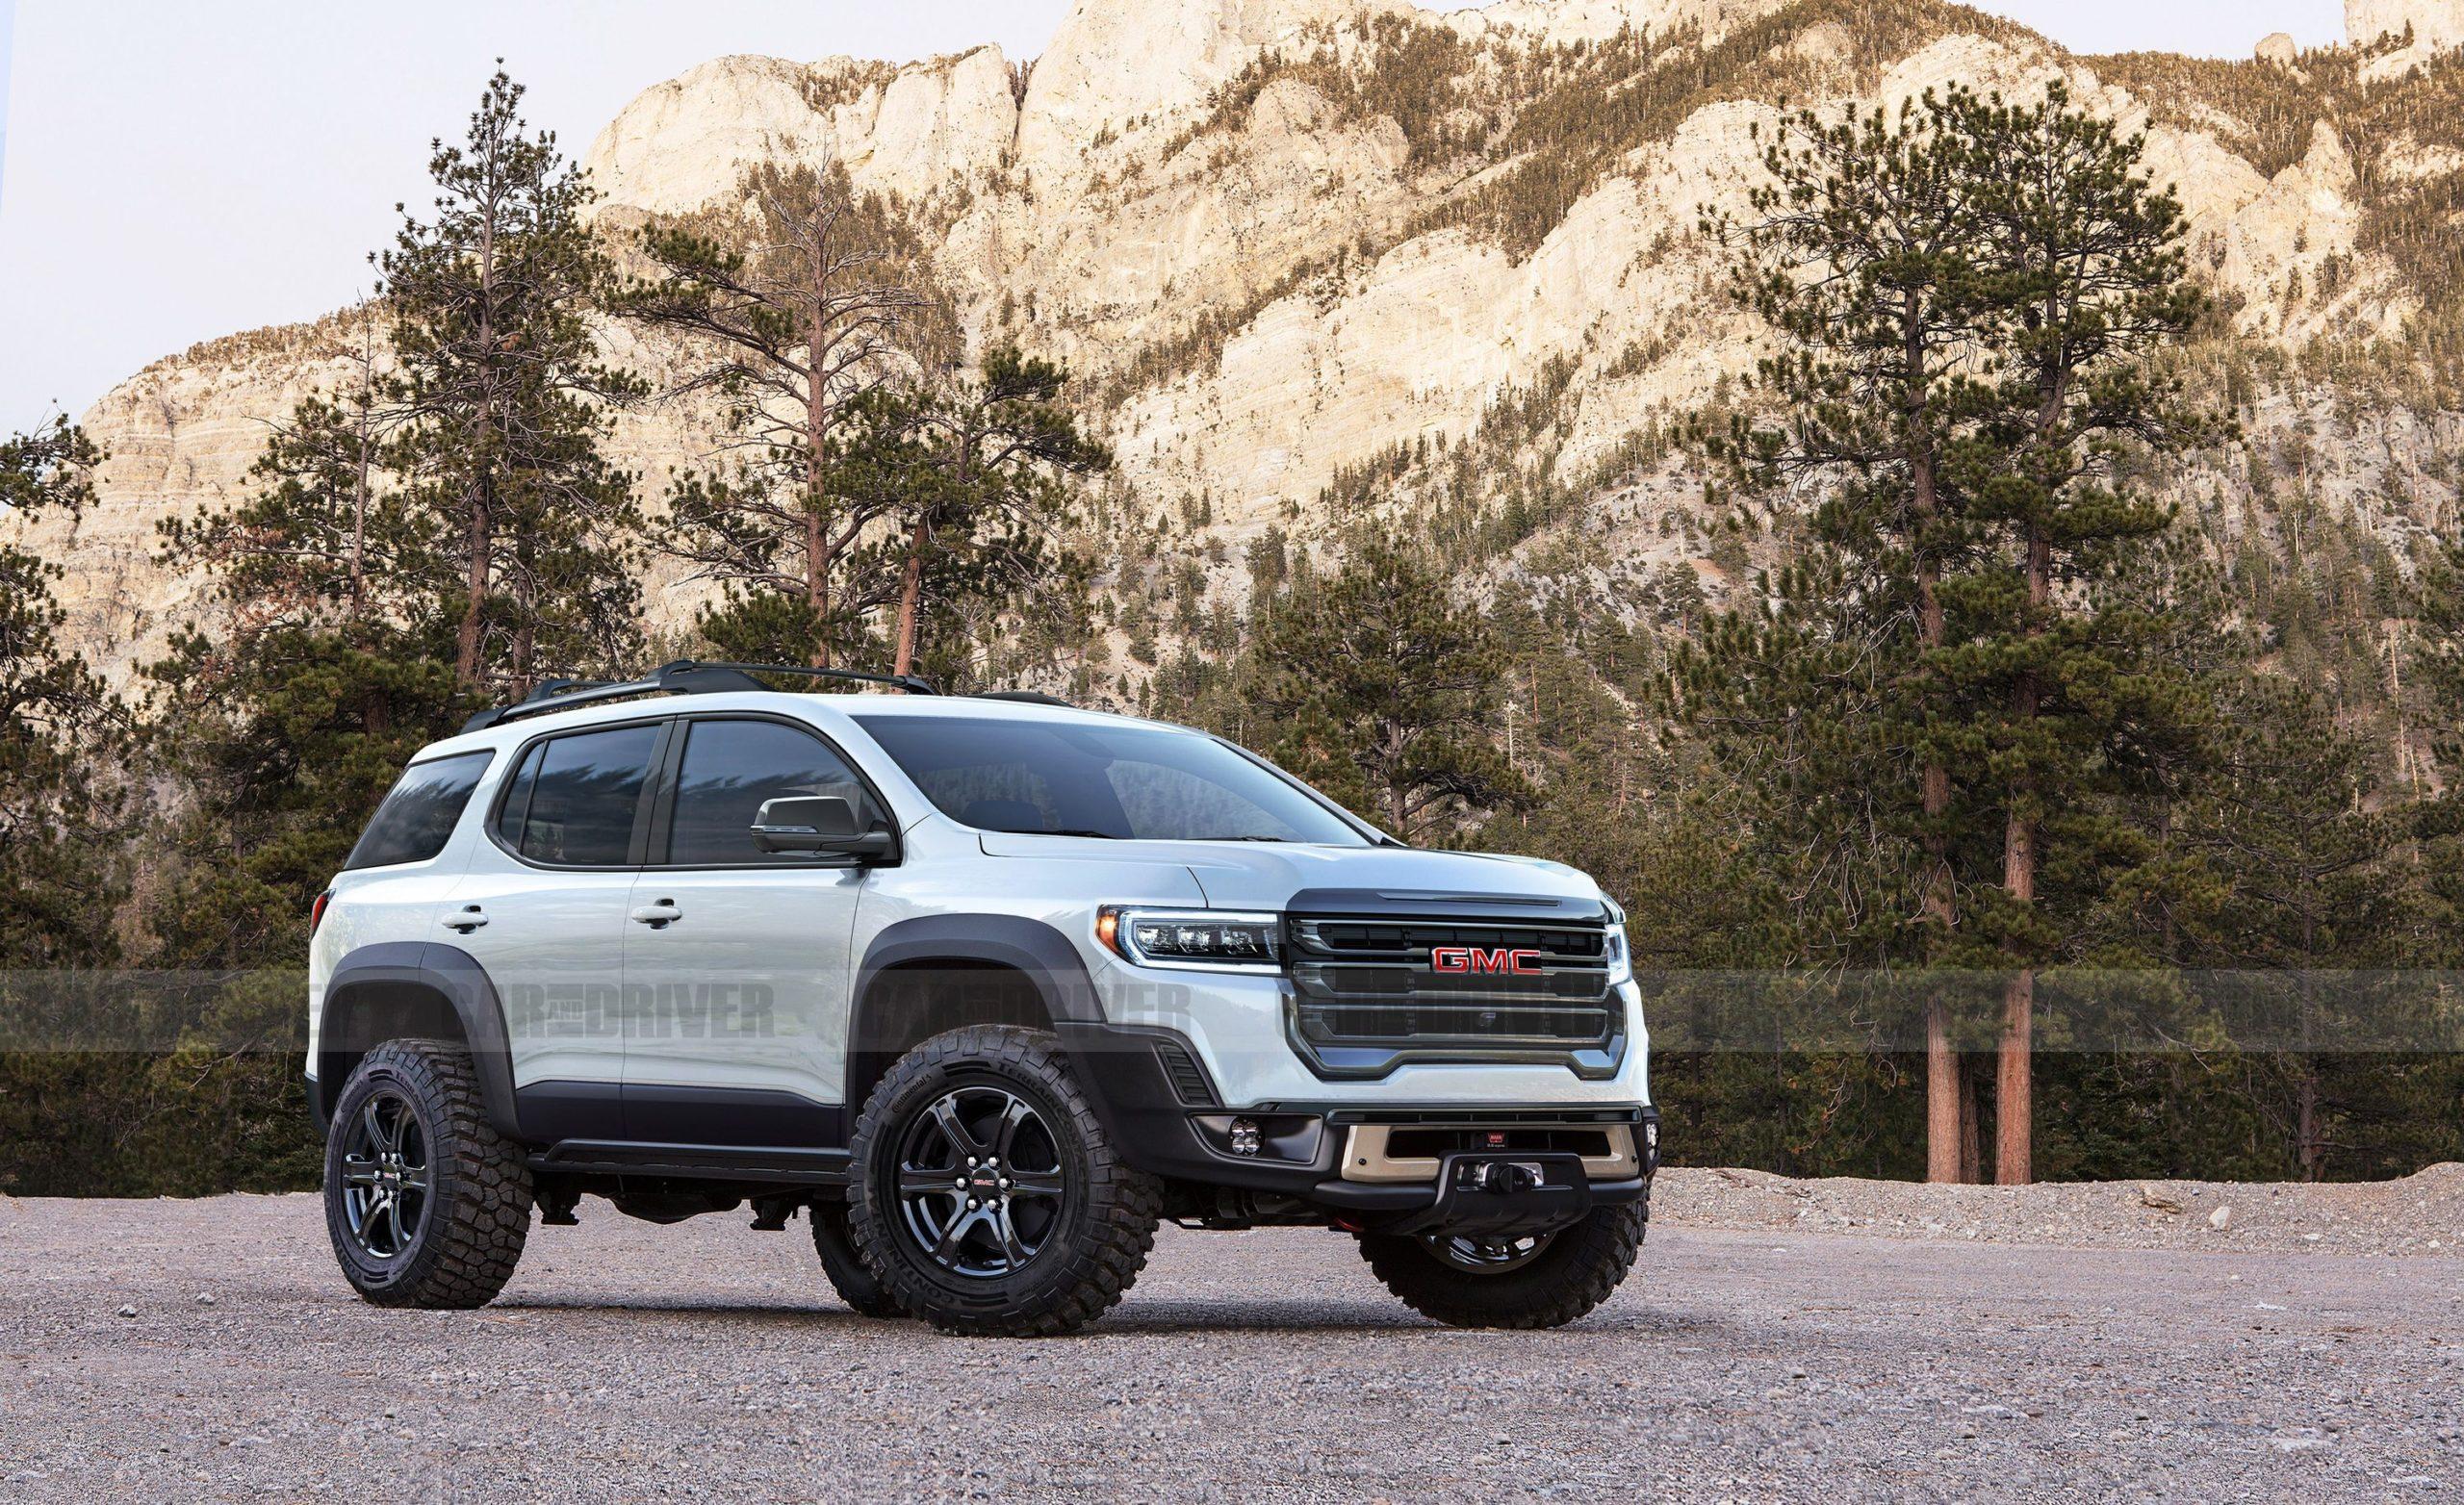 2022 Chevrolet Trailblazer Interior